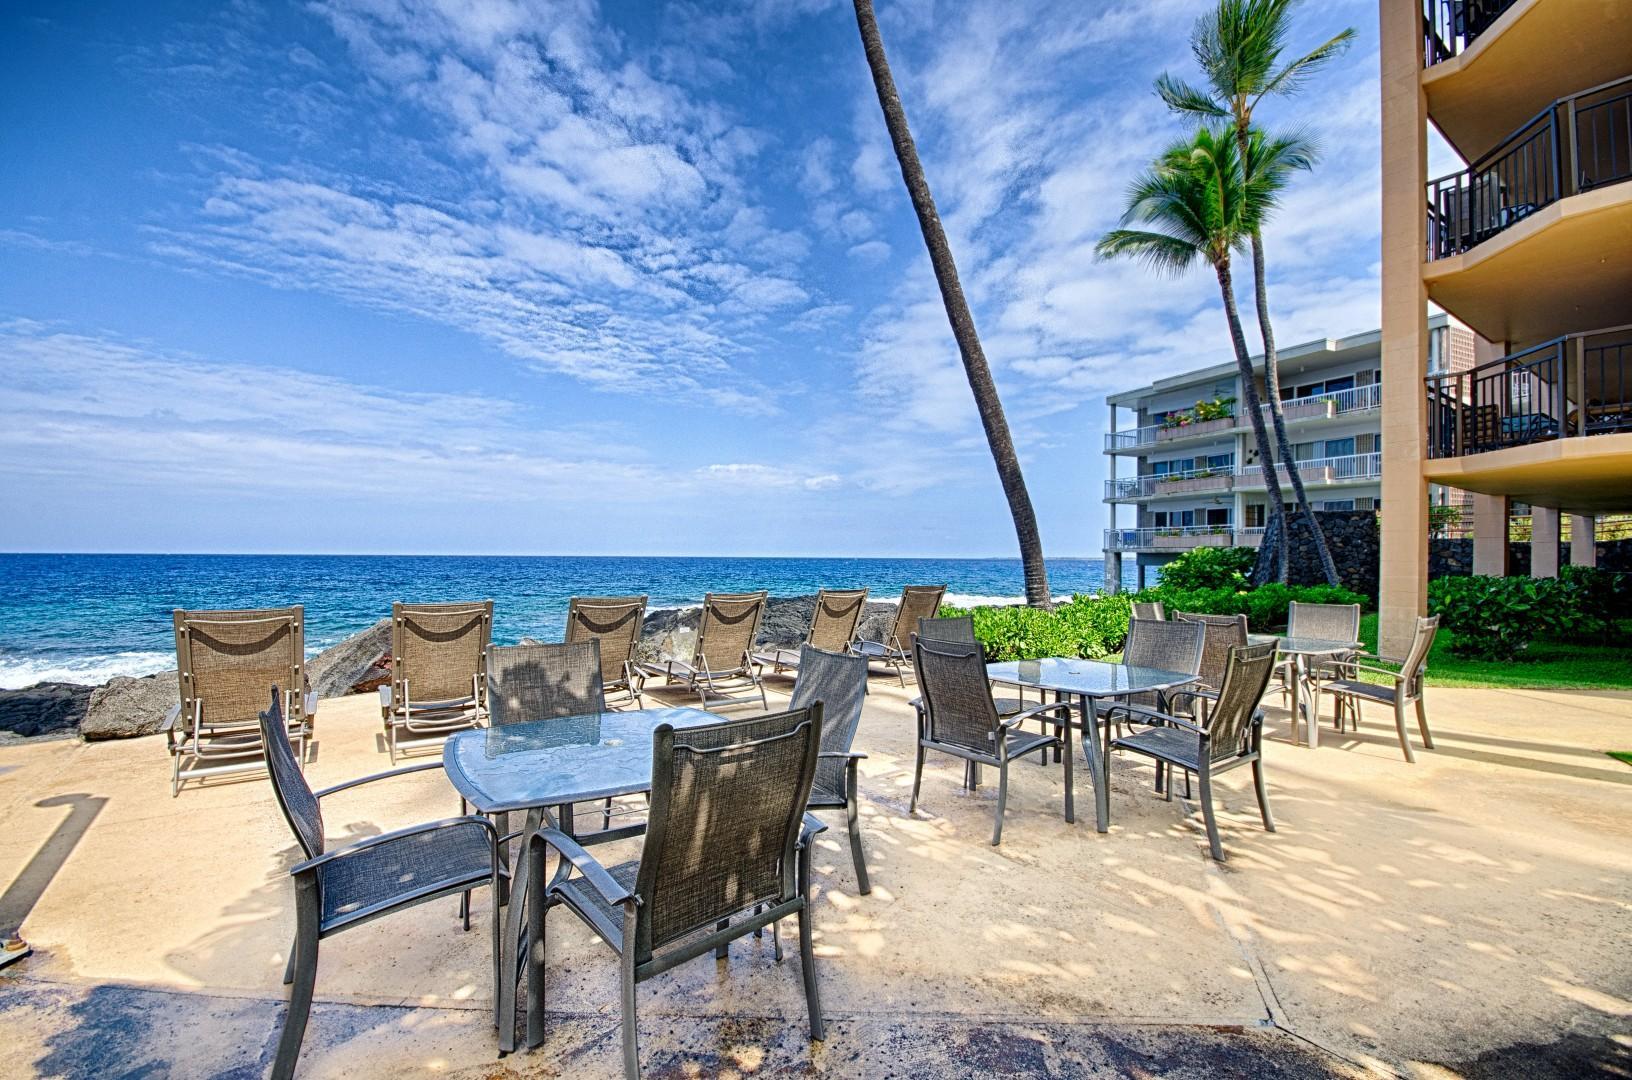 Kona Makai communal dining by the ocean!